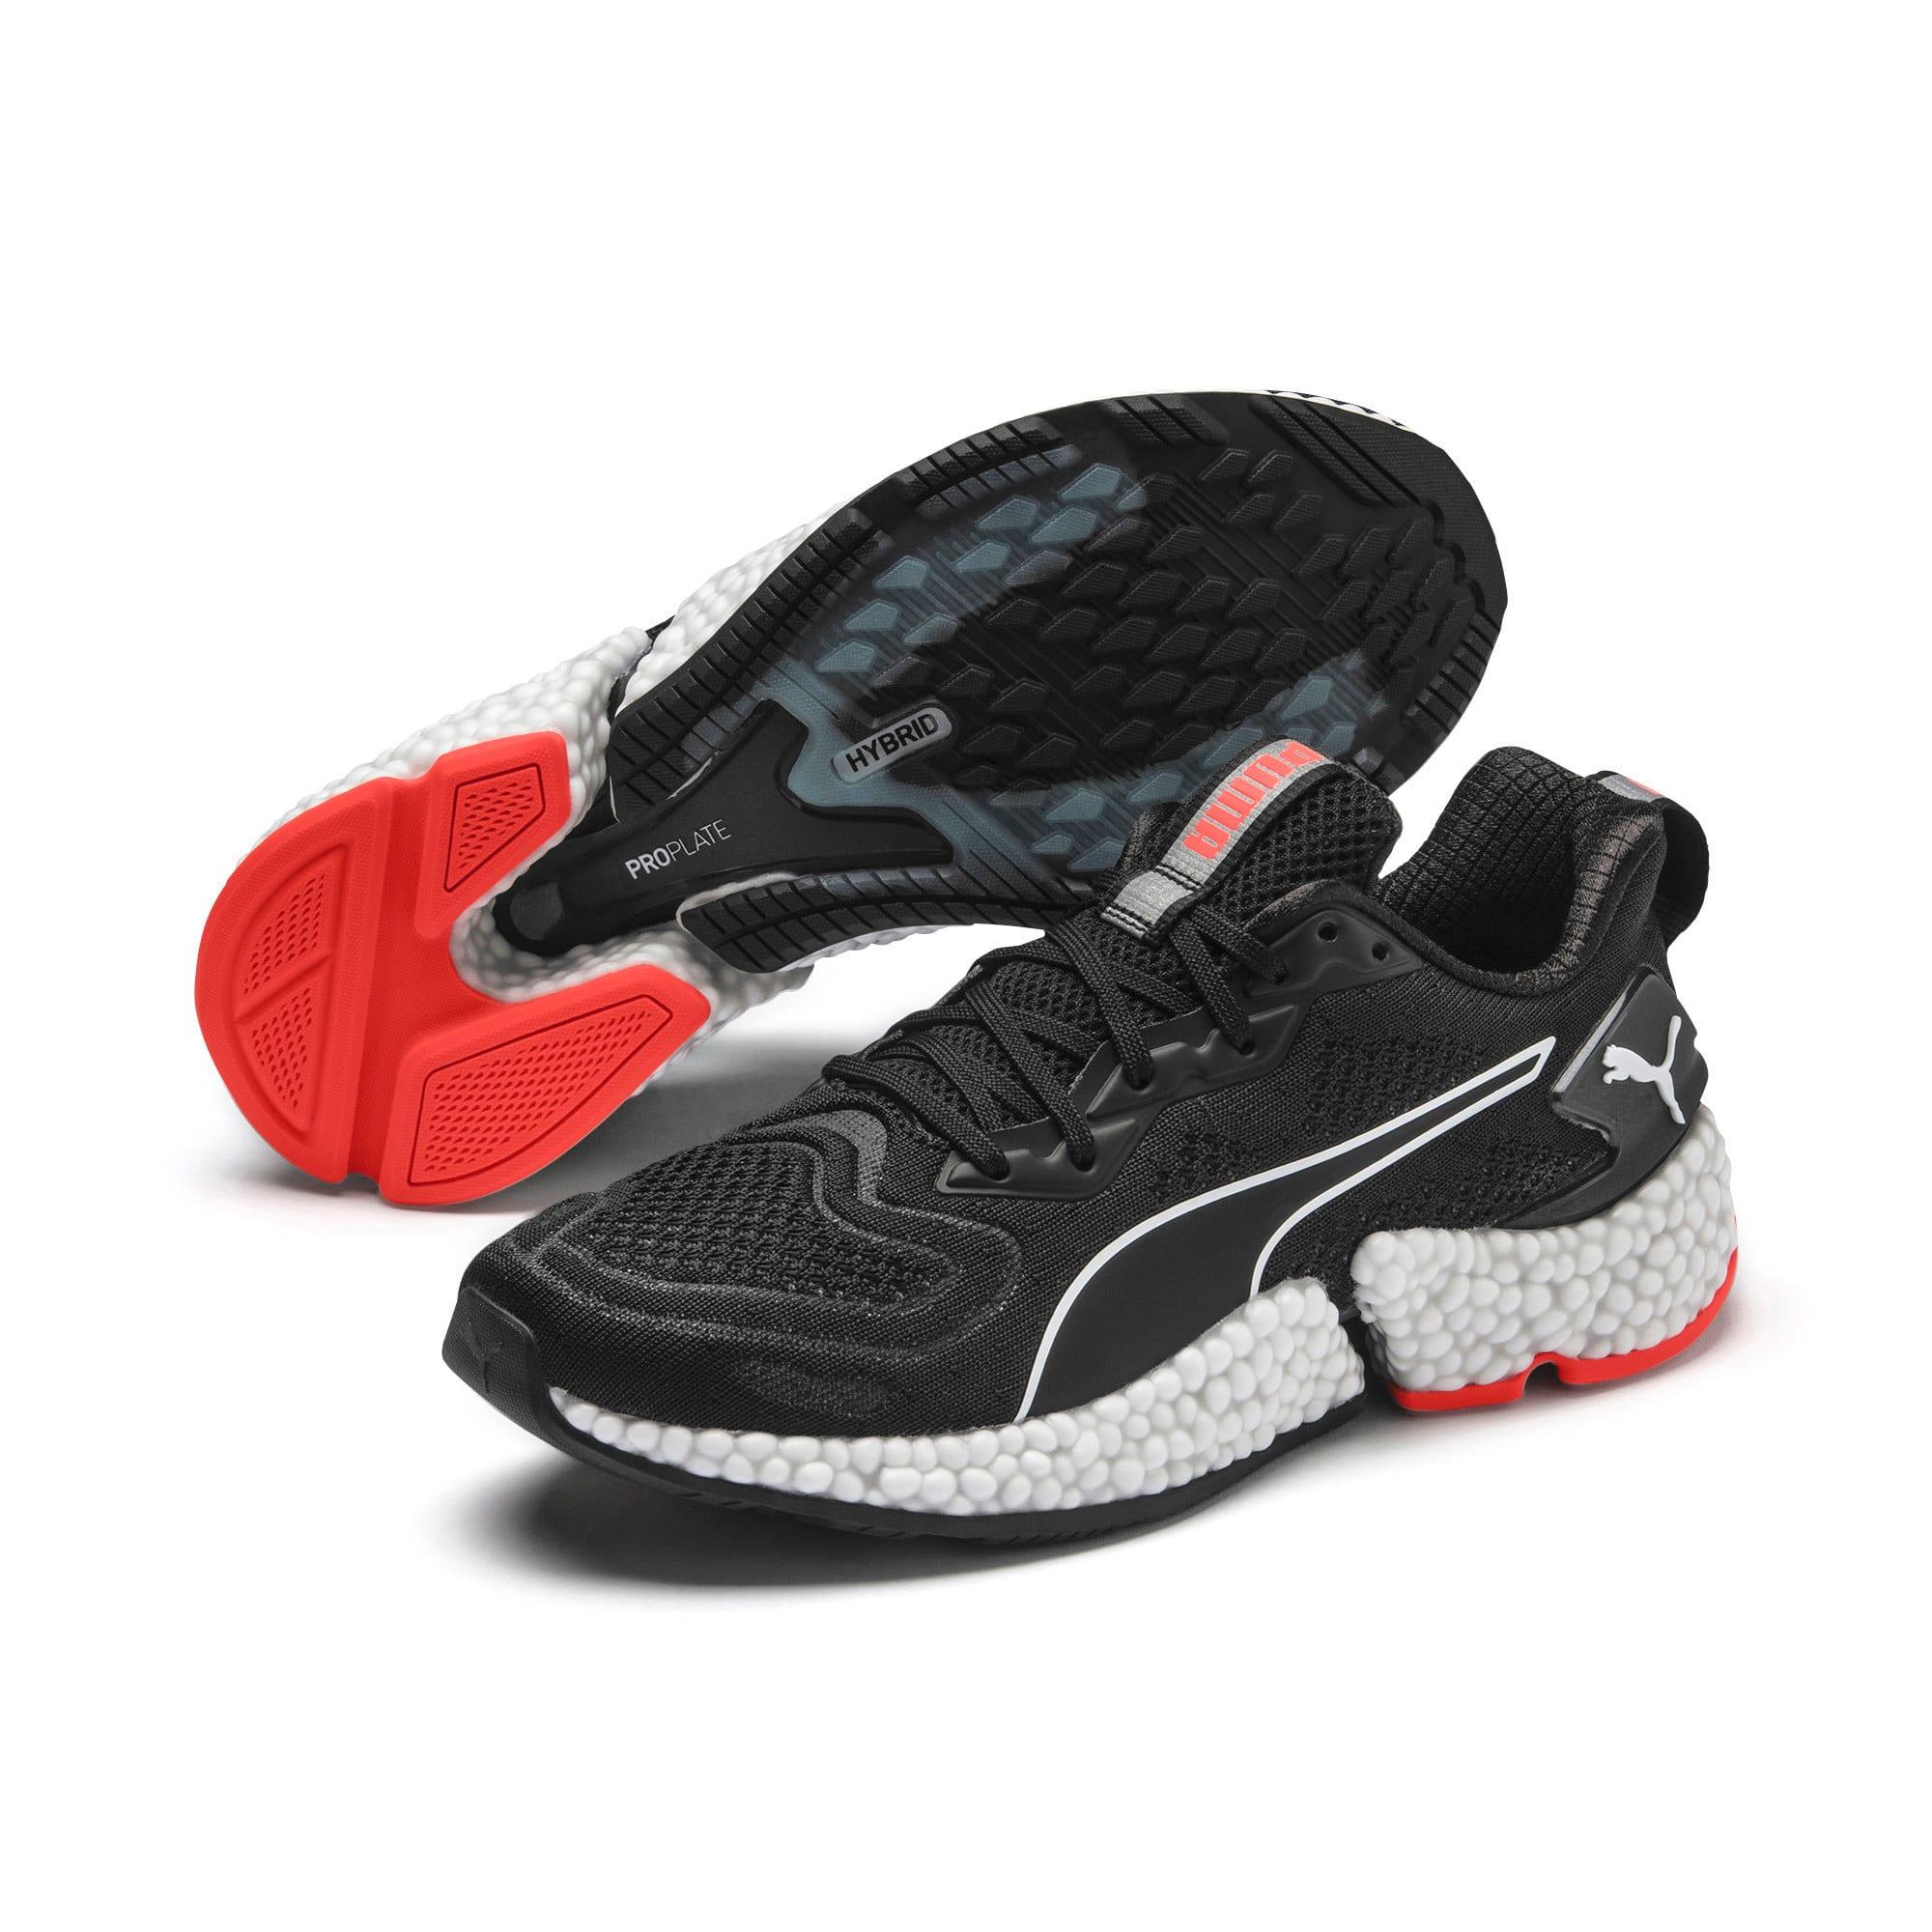 Miniatura 3 de Zapatos para correr SPEED Orbiter para mujer, Black-Red-Milky Blue-White, mediano